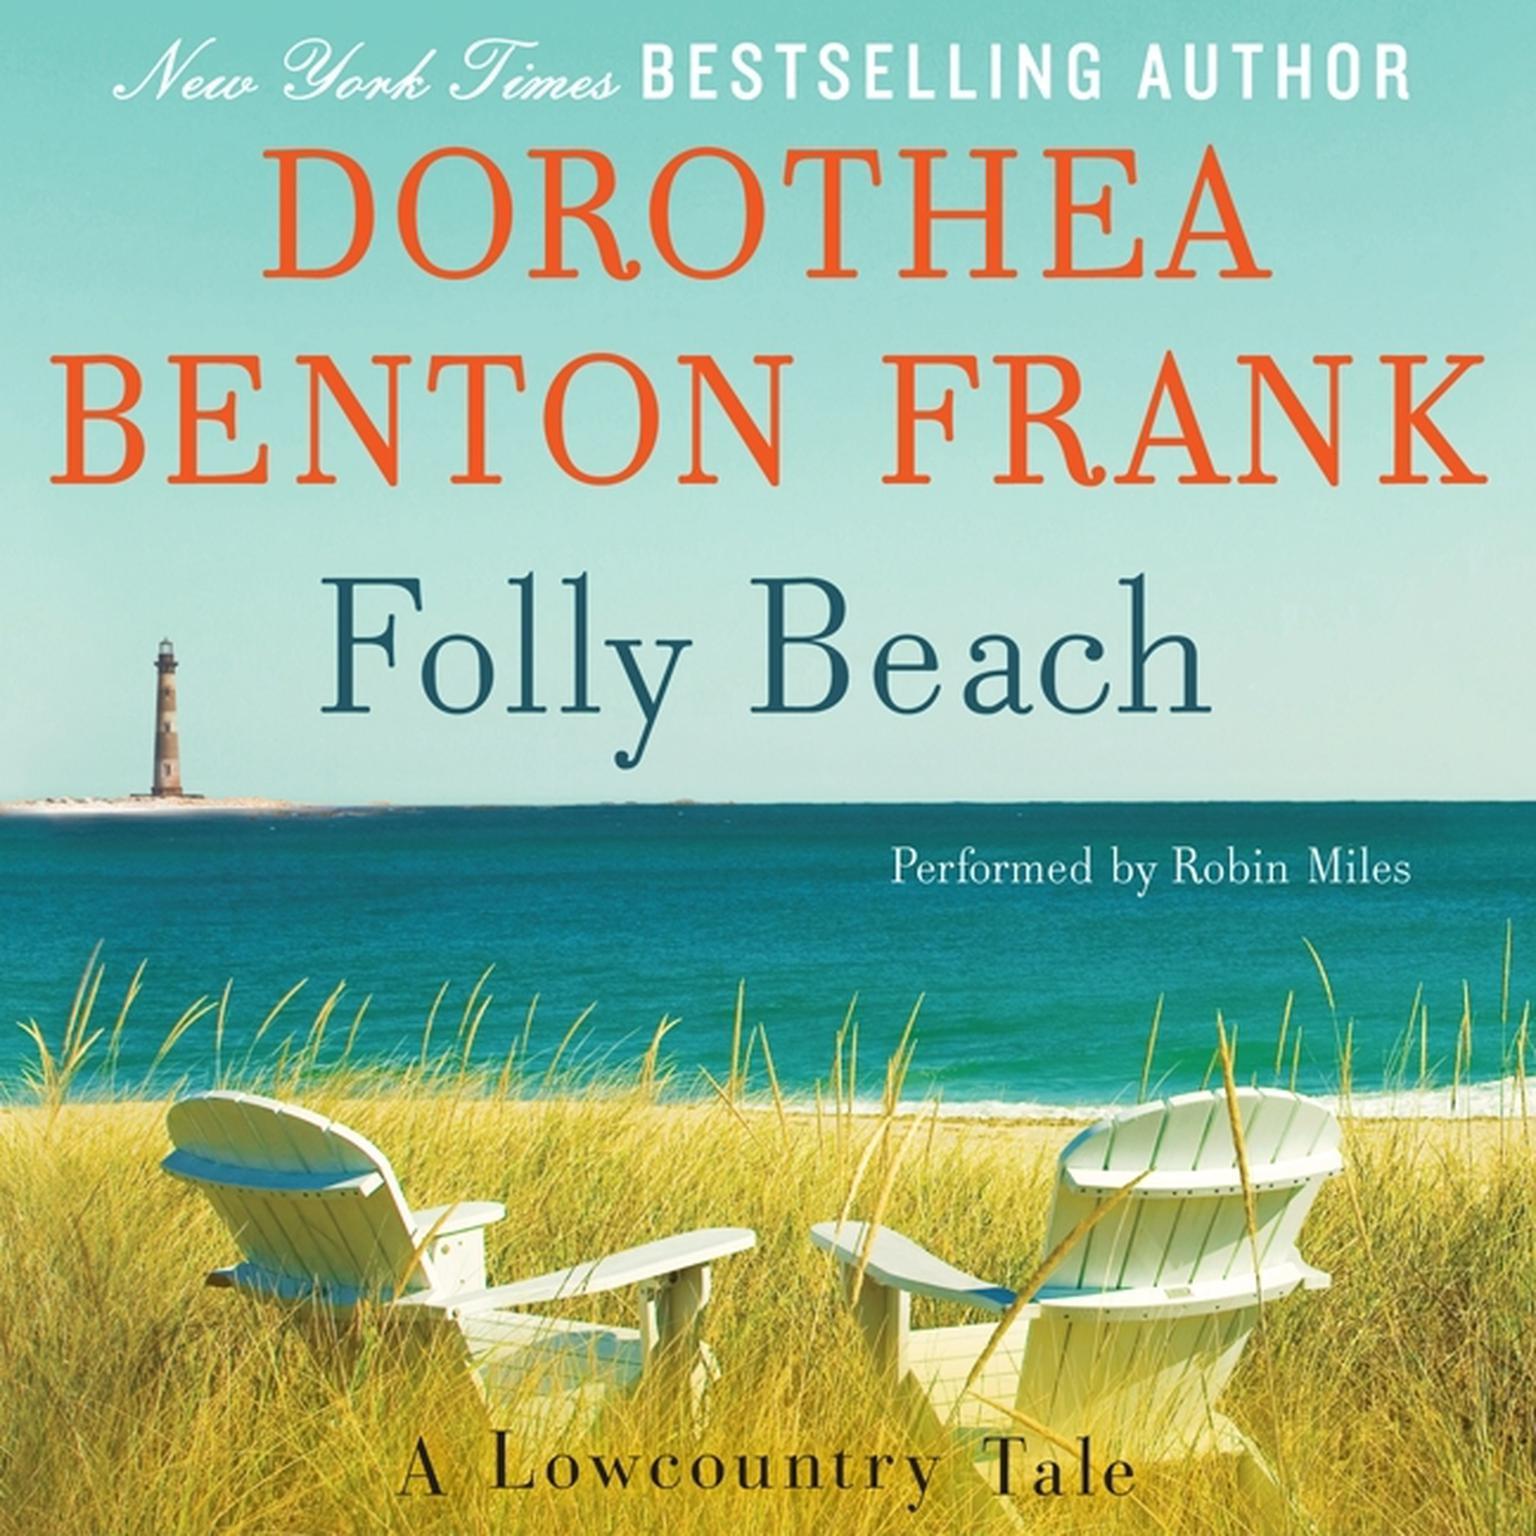 Printable Folly Beach: A Lowcountry Tale Audiobook Cover Art